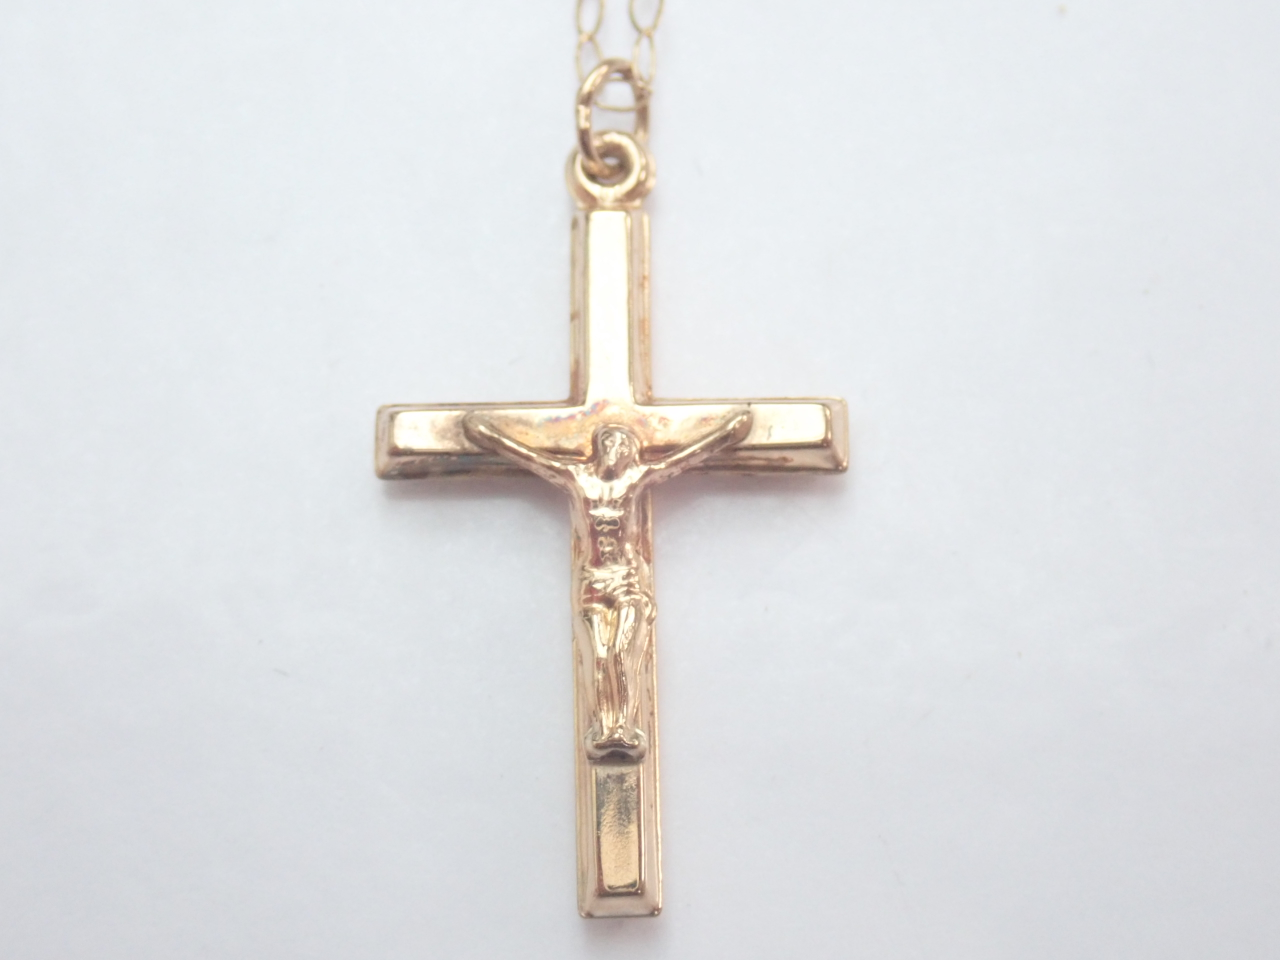 Cross Crucifix Jesus 9K Gold Pendant 16